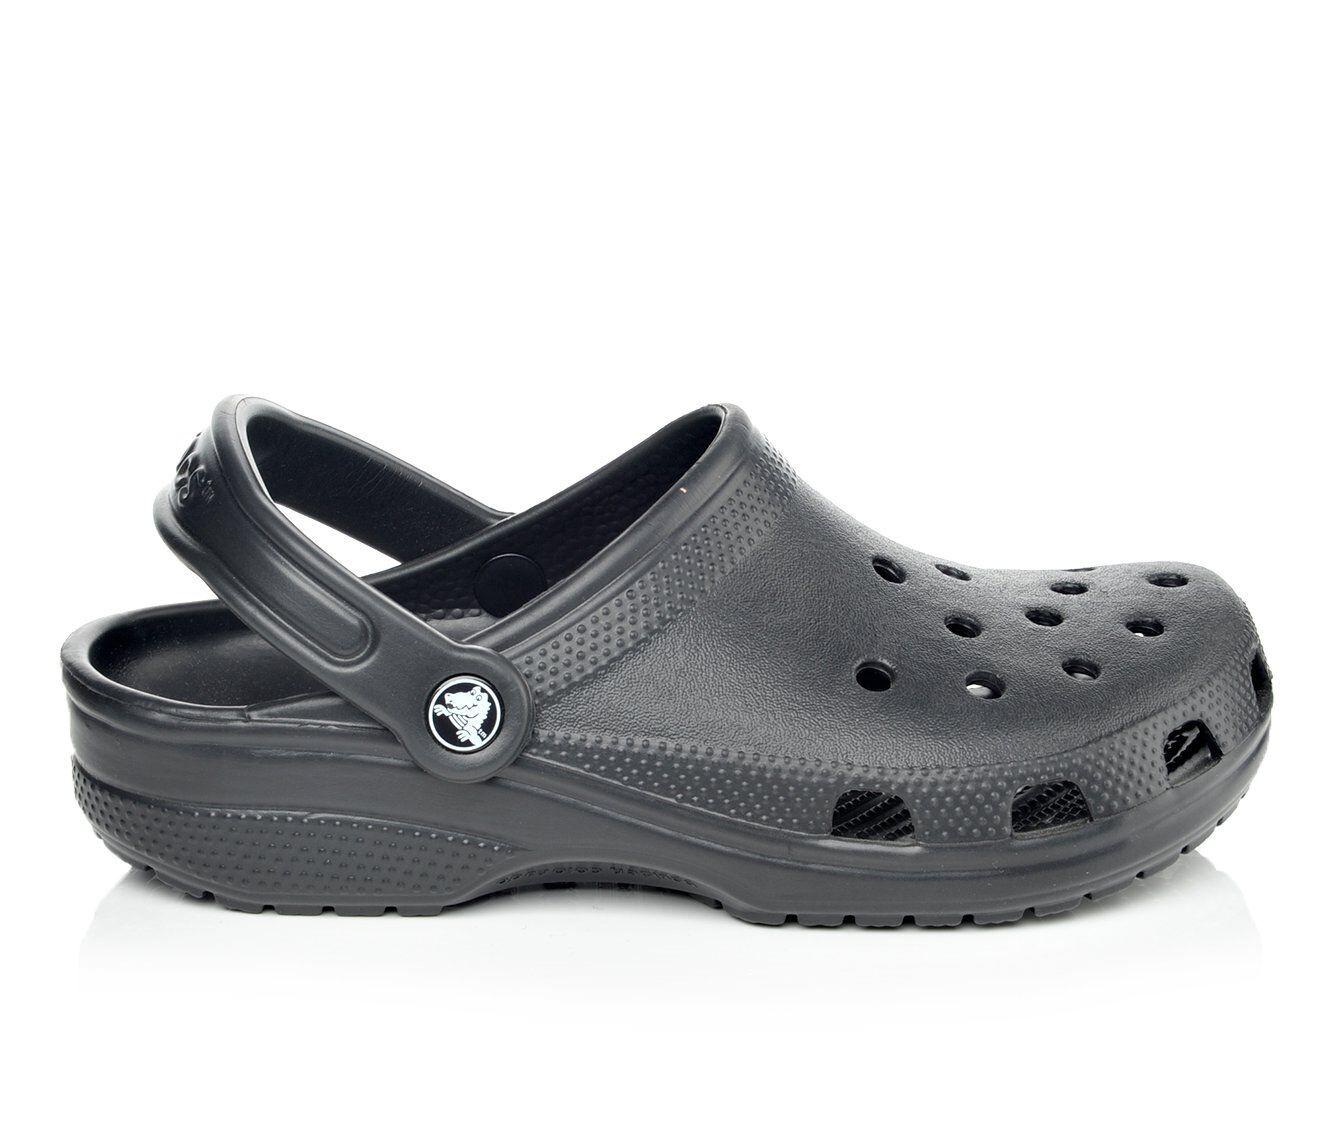 Women's Crocs Classic Clogs Black